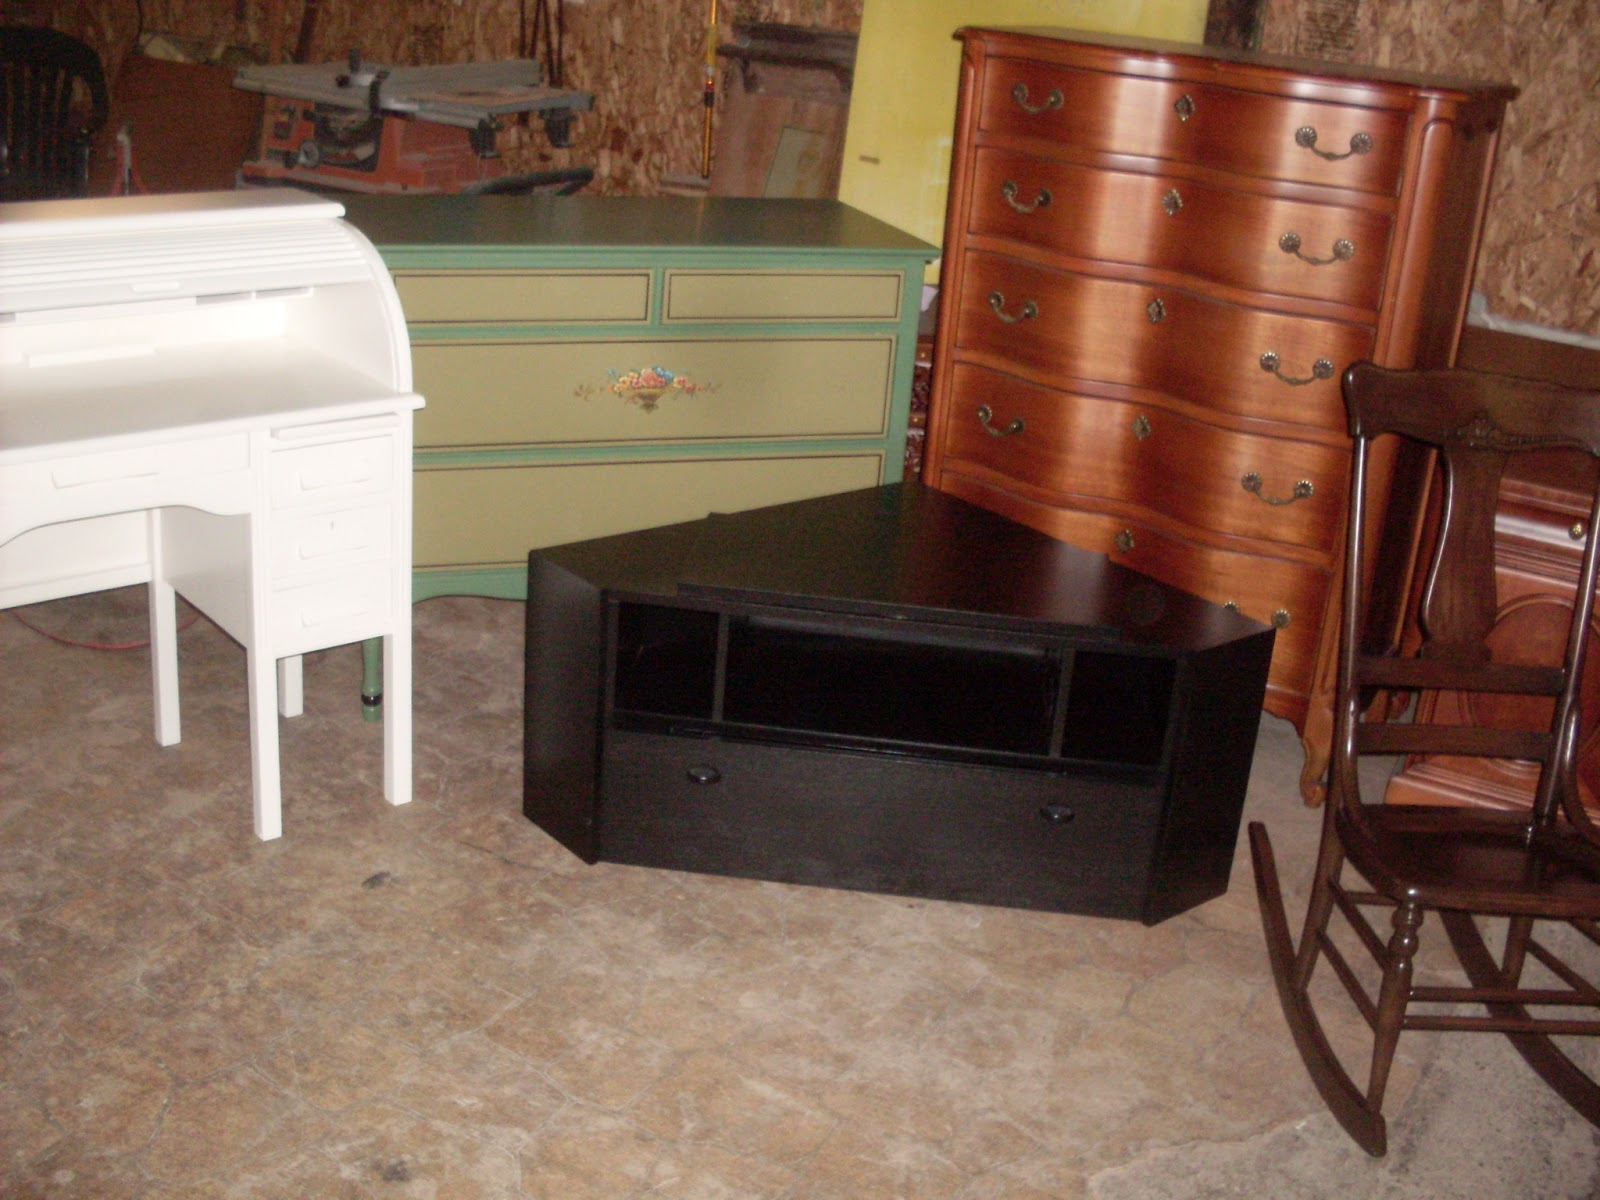 Furniture Refinishing Antique Refinishing Repair Grand Rapids Michigan